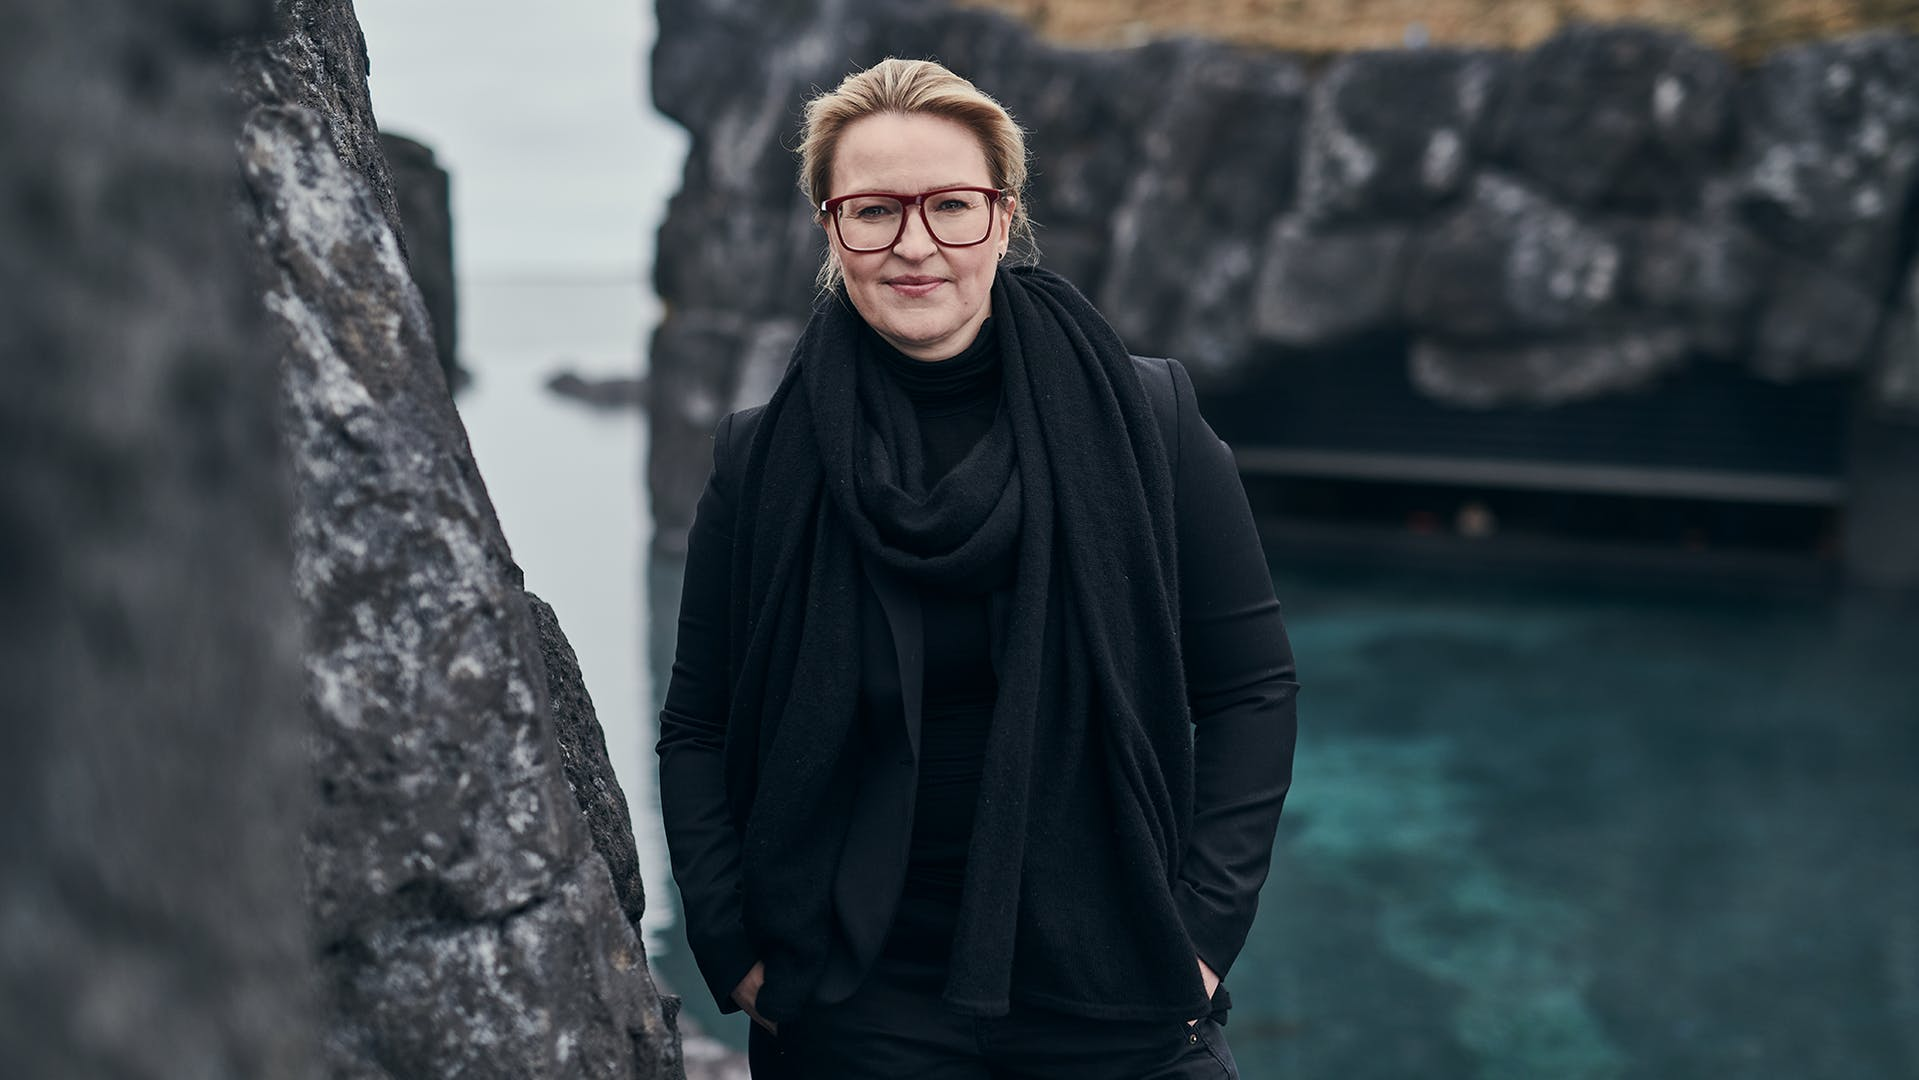 Dagný Pétursdóttir